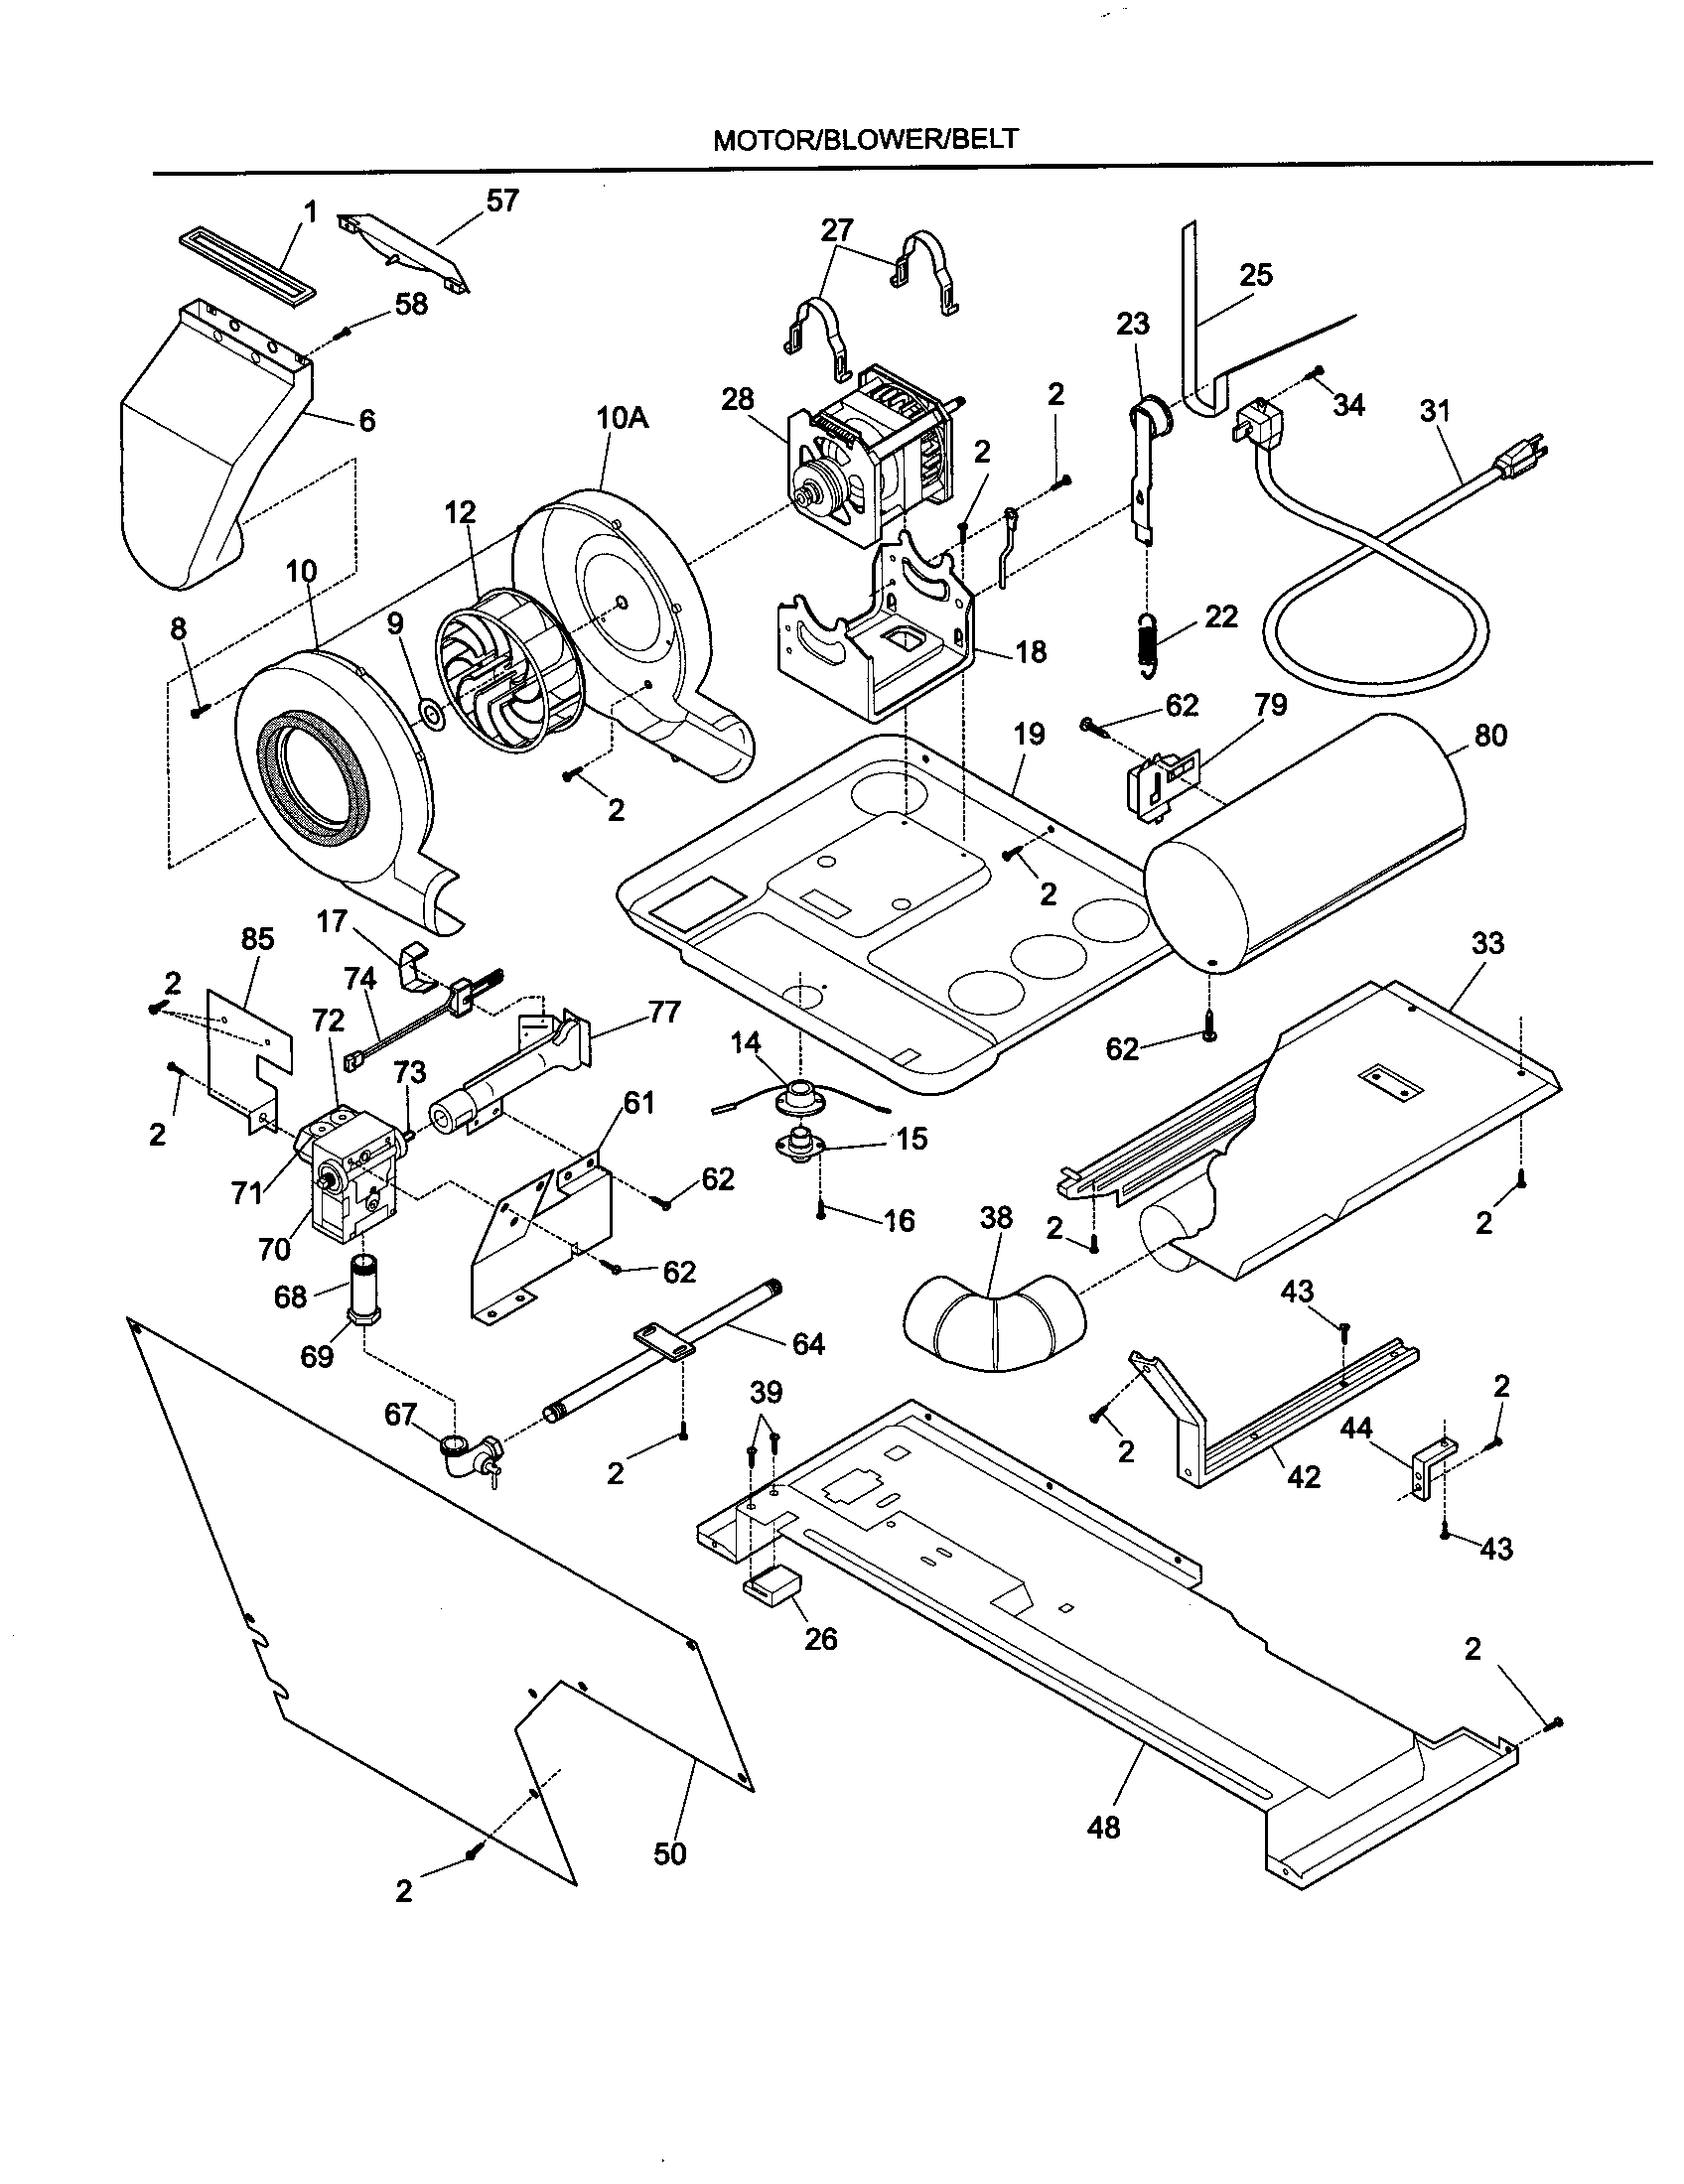 MOTOR/BLOWER/BELT Diagram & Parts List for Model 970